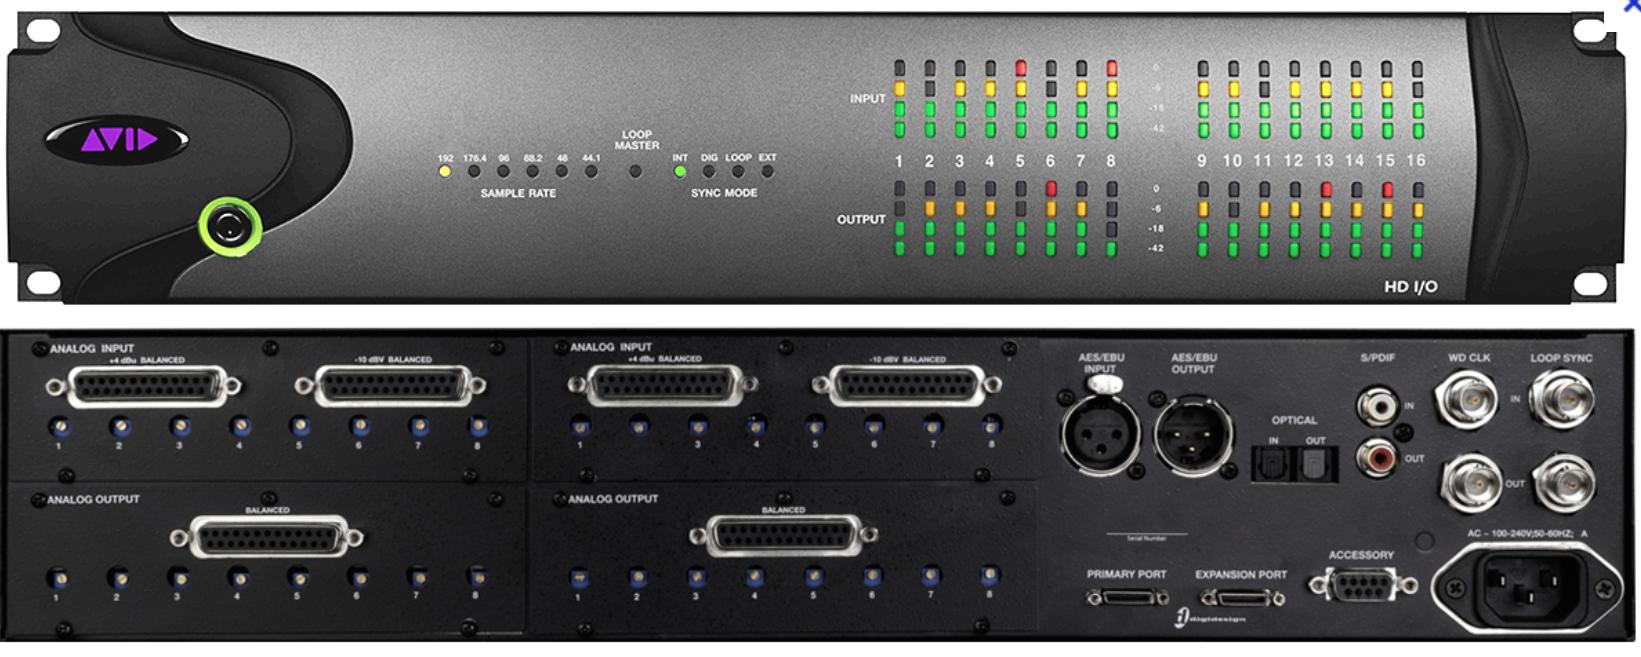 Avid HD I/O 8X8X8 image (#922113) - Audiofanzine